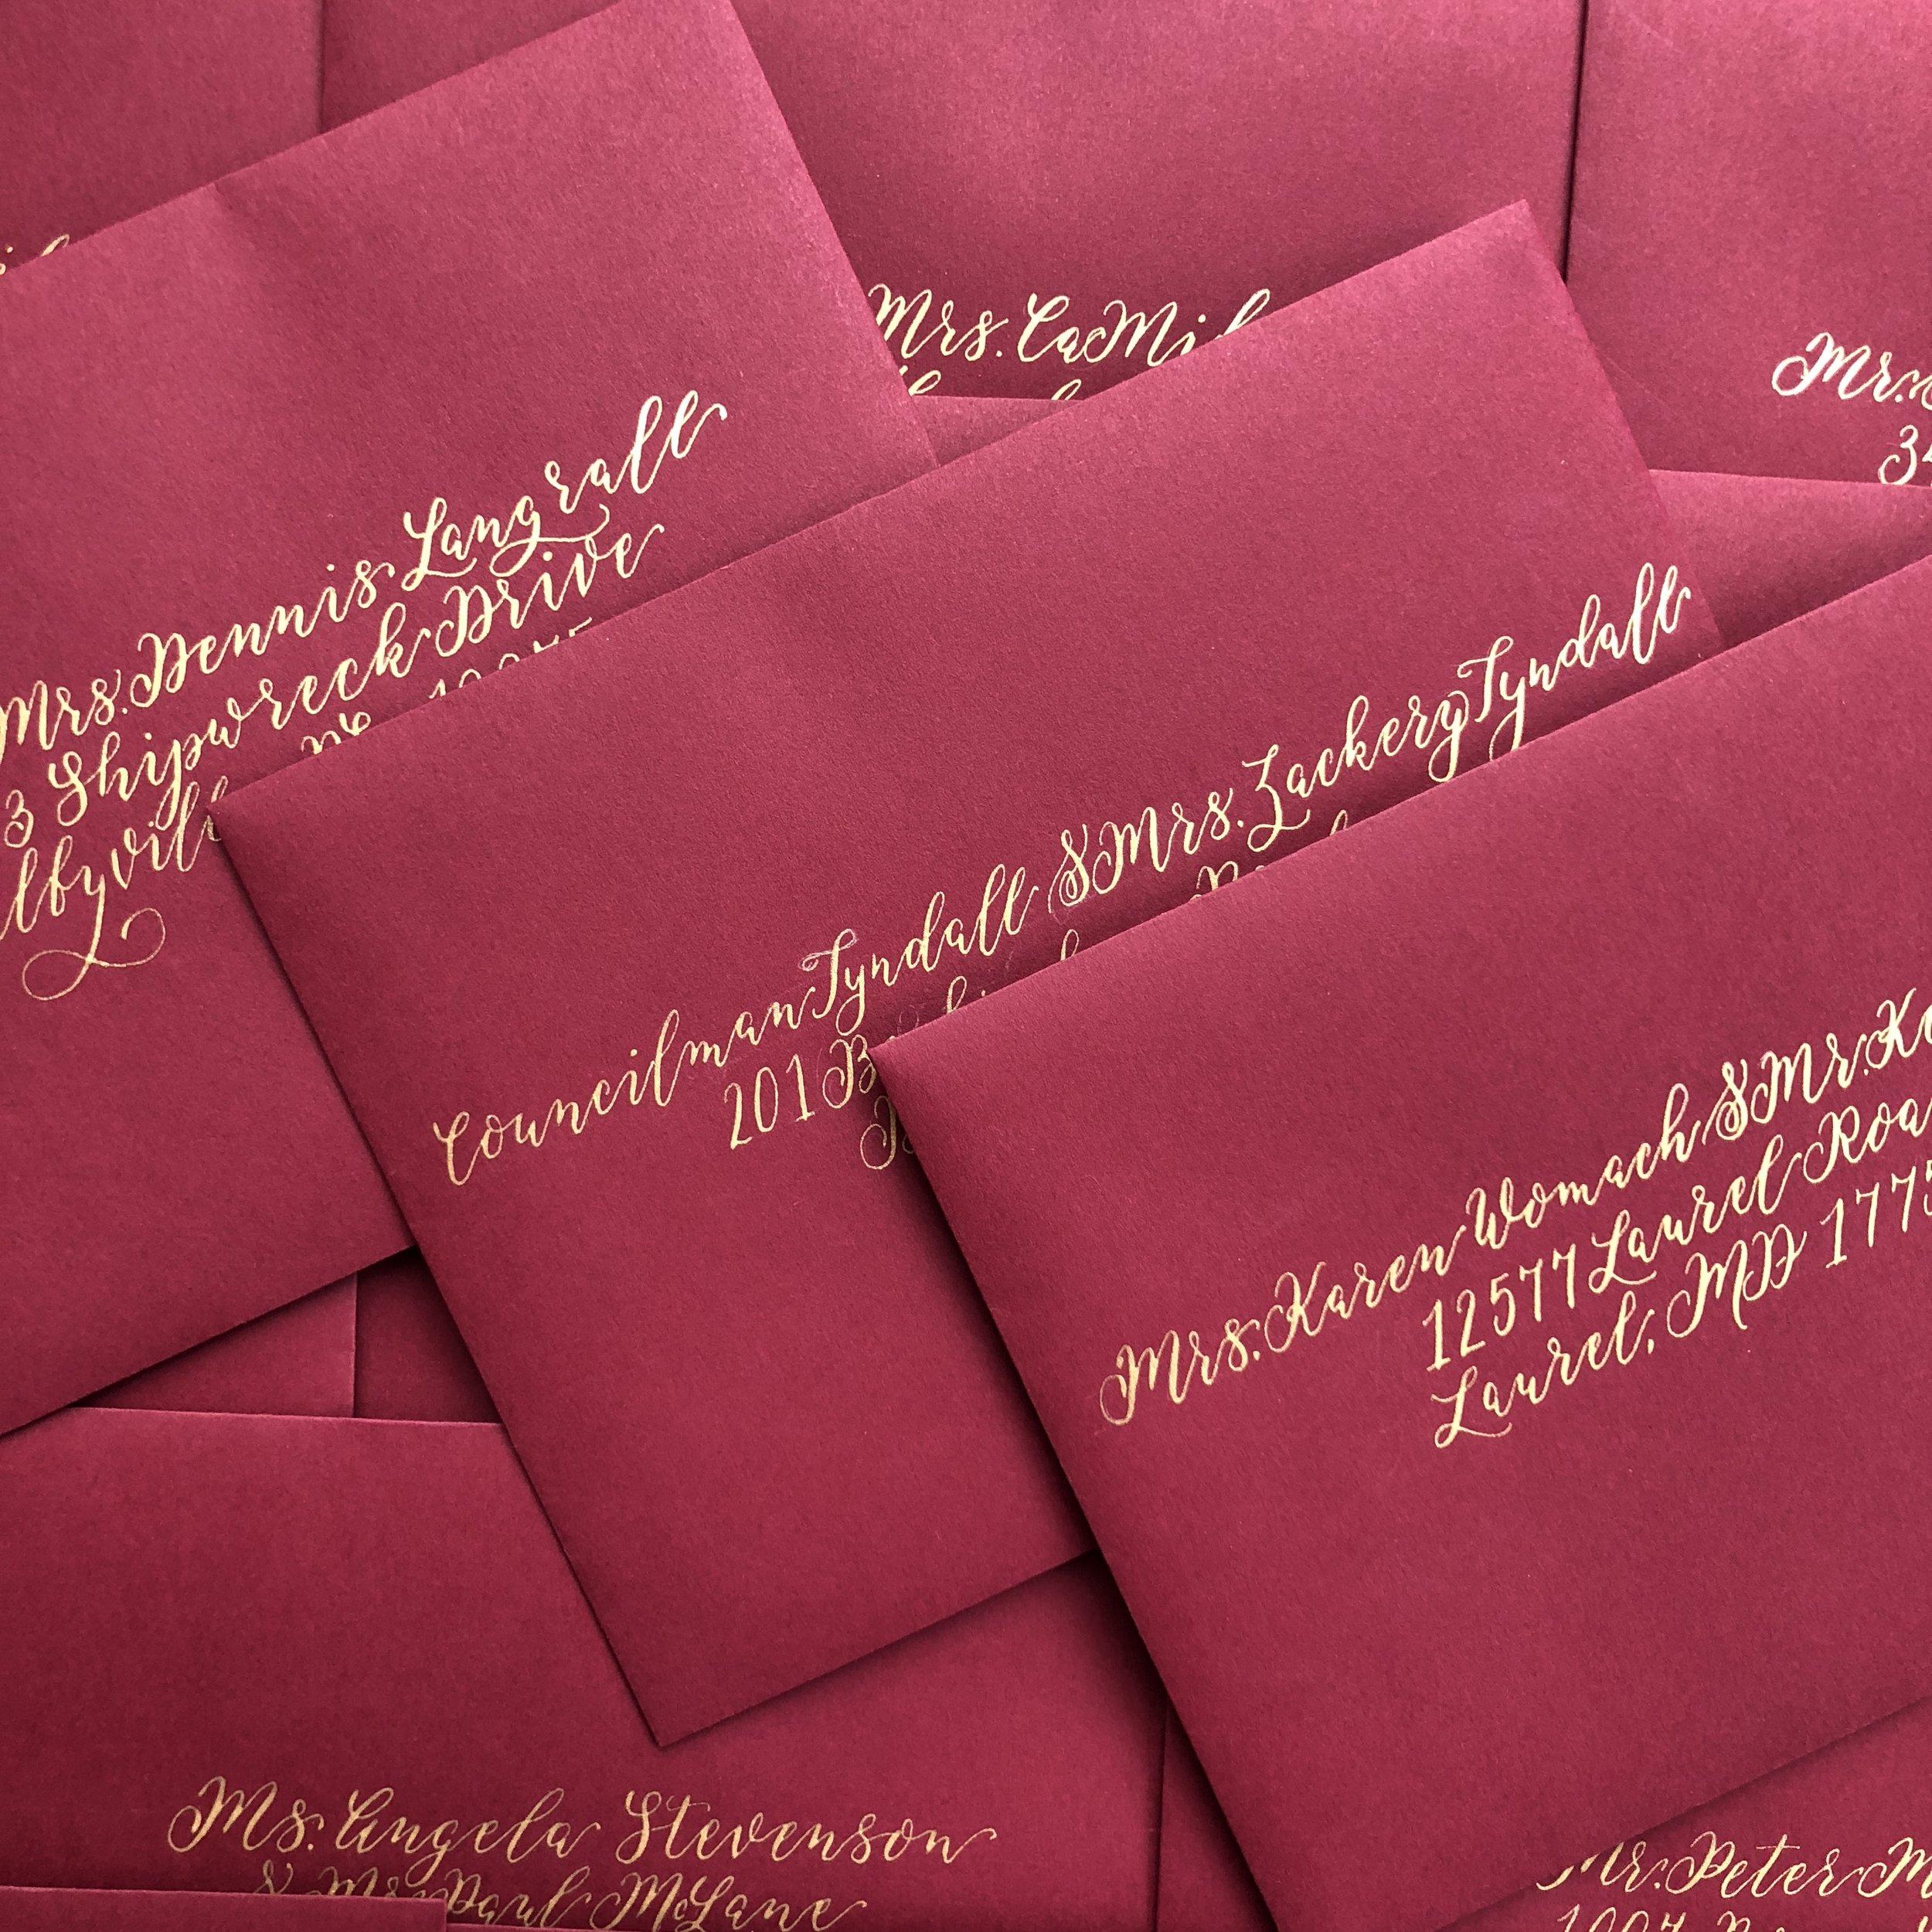 Central PA, York PA, JesSmith Designs, custom, wedding, invitations, bridal, announcements, save the date, baby, hanover, calligraphy, baltimore, wedding invitations, lancaster, gettysburg-04-25 18.23.40.jpg